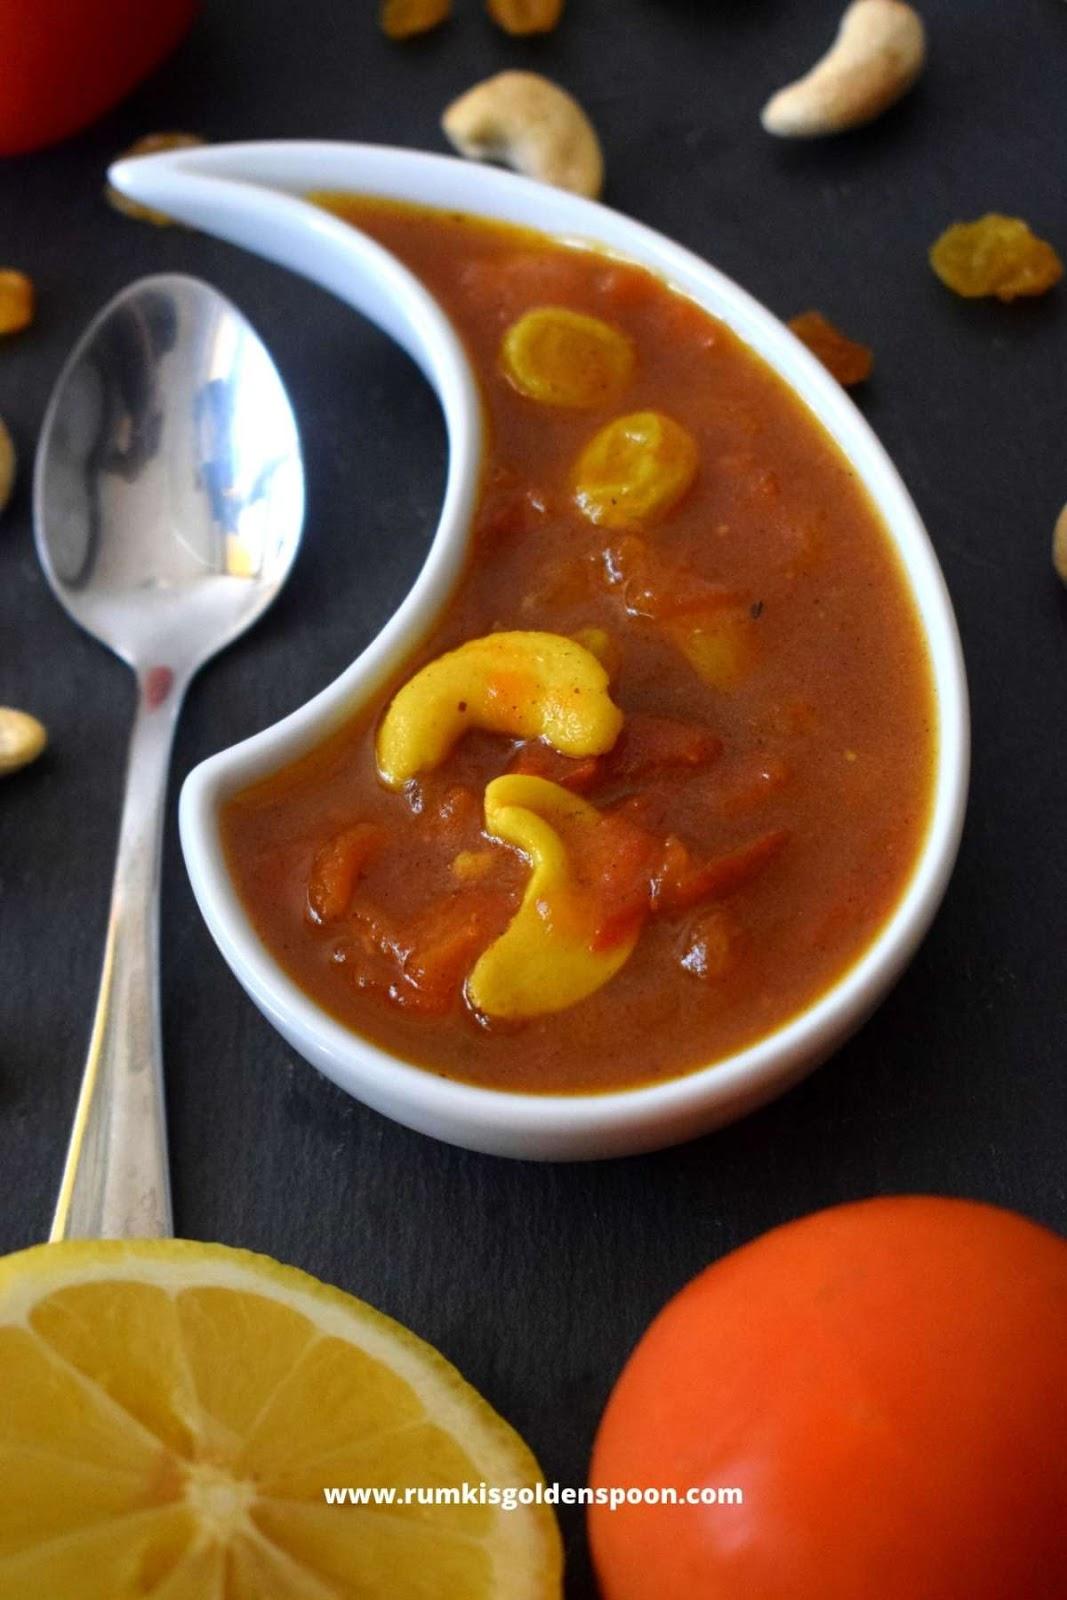 Tomato chutney, recipes with tomato chutney, tomato chutney recipe, Sweet Tomato chutney, bengali tomato chutney, Rumki's Golden Spoon